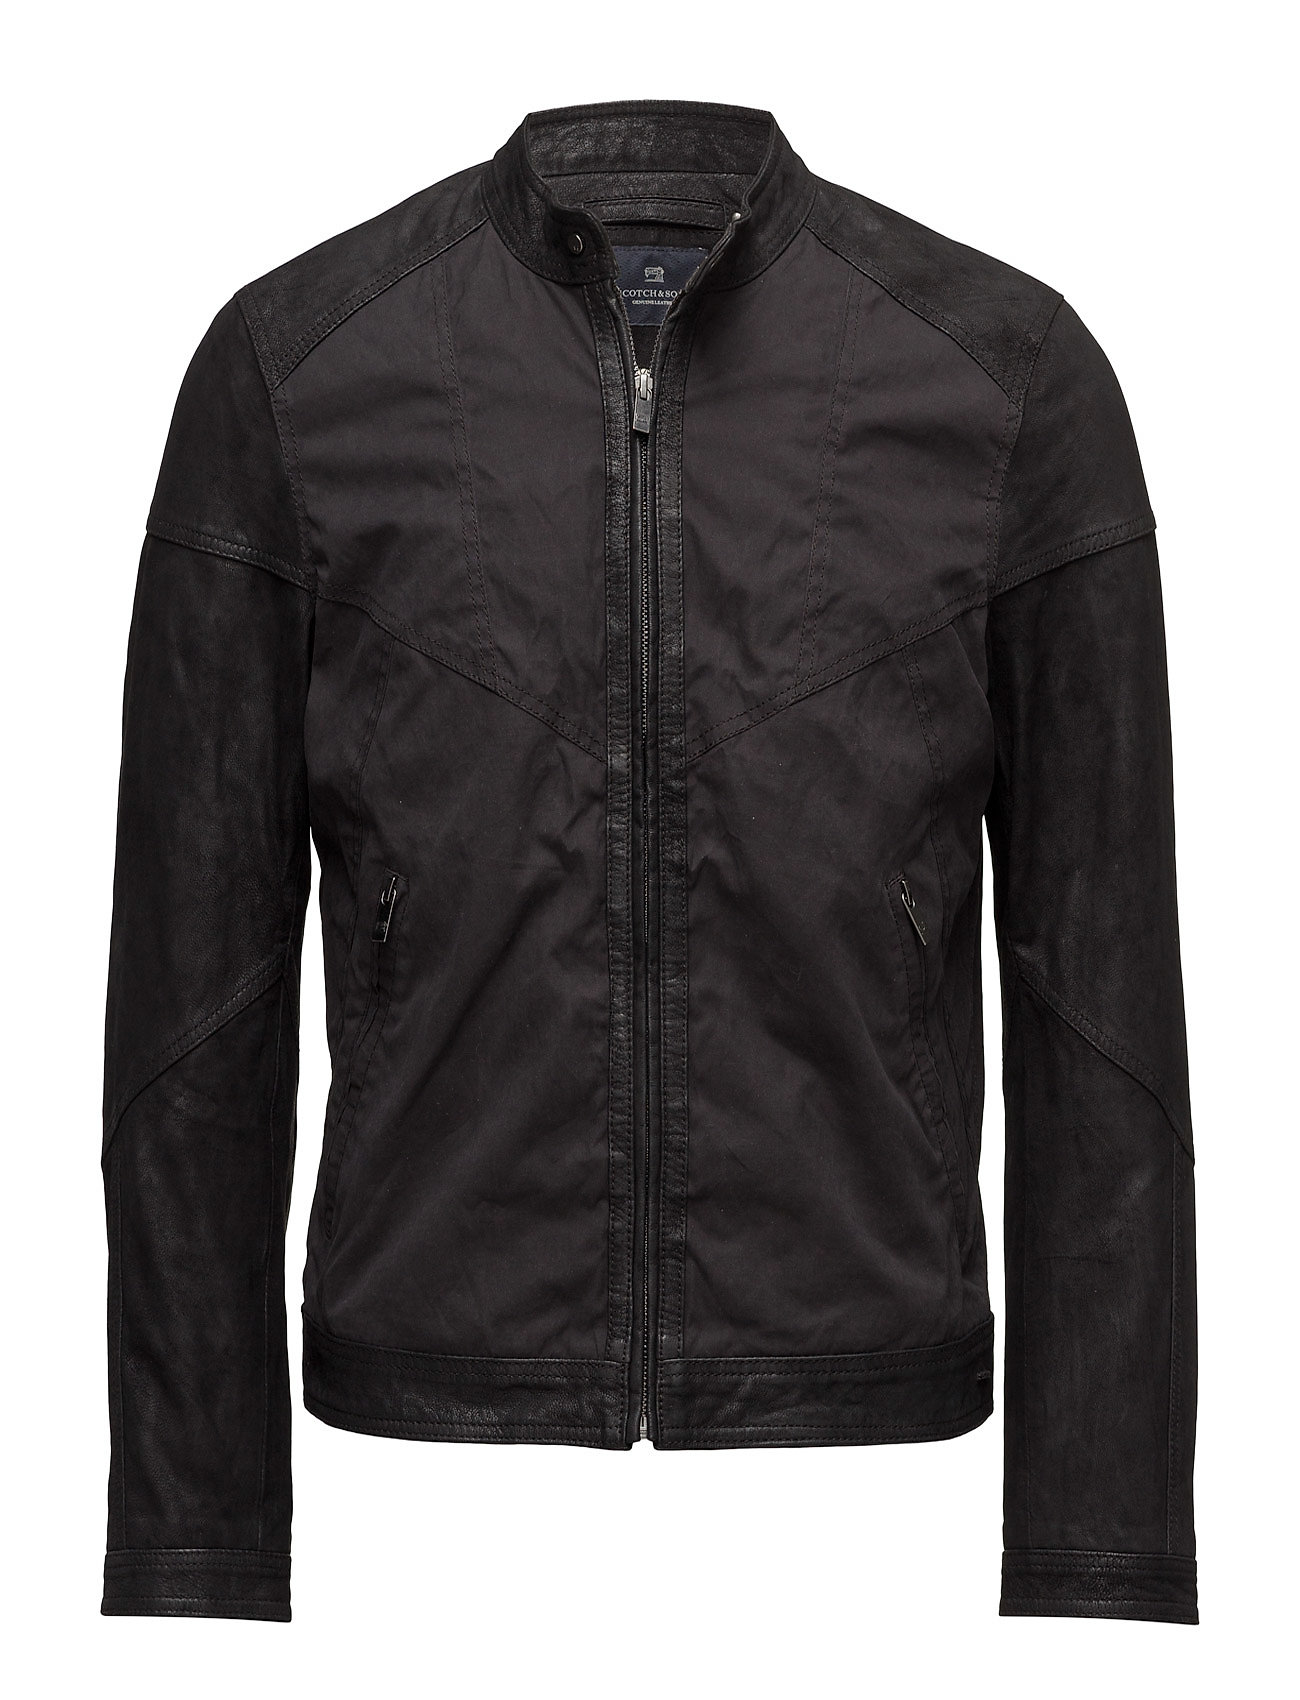 scotch & soda – Jacket in mix & match nylon/ leather fra boozt.com dk